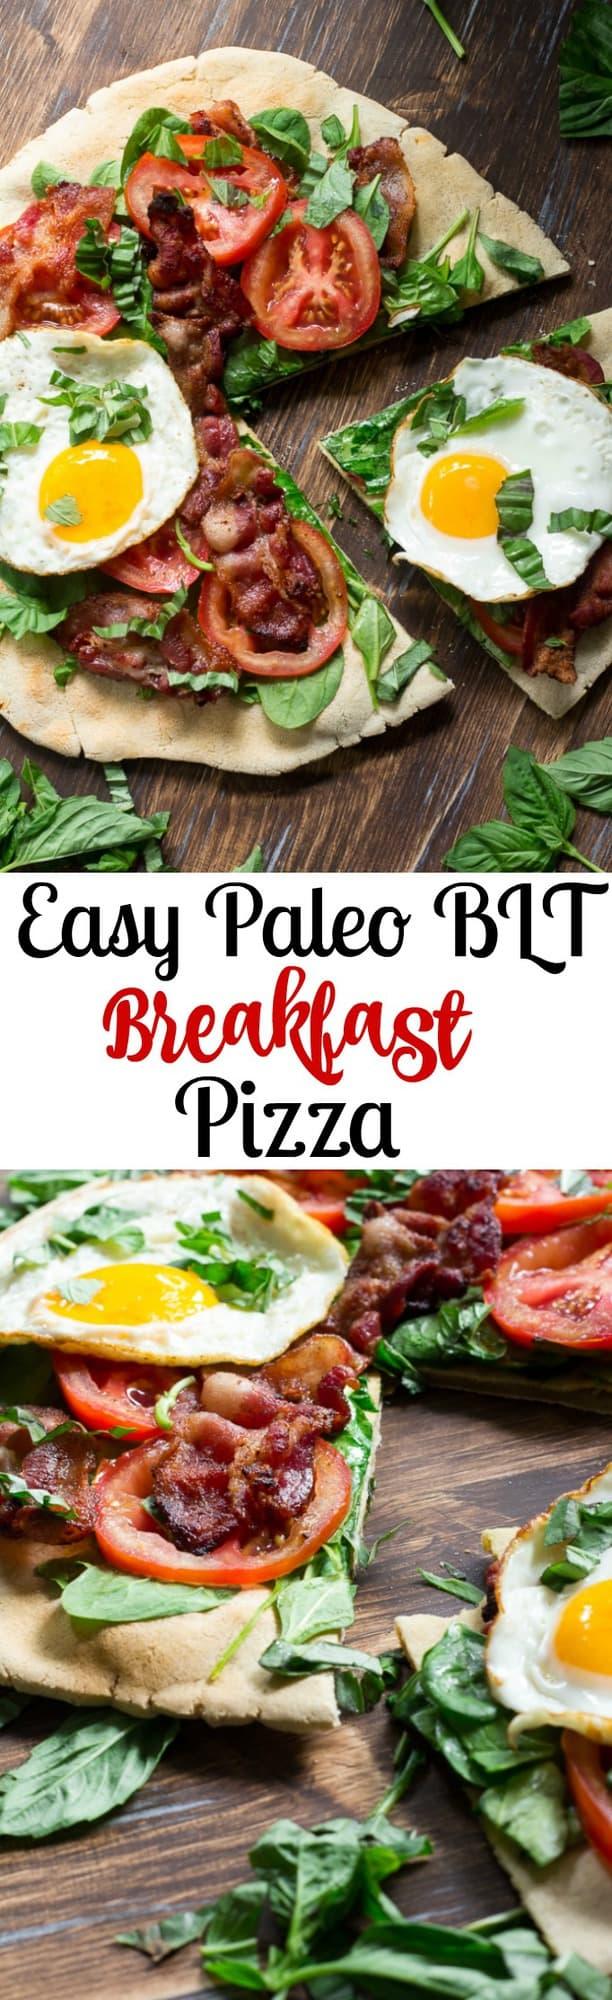 Easy Paleo BLT breakfast pizza